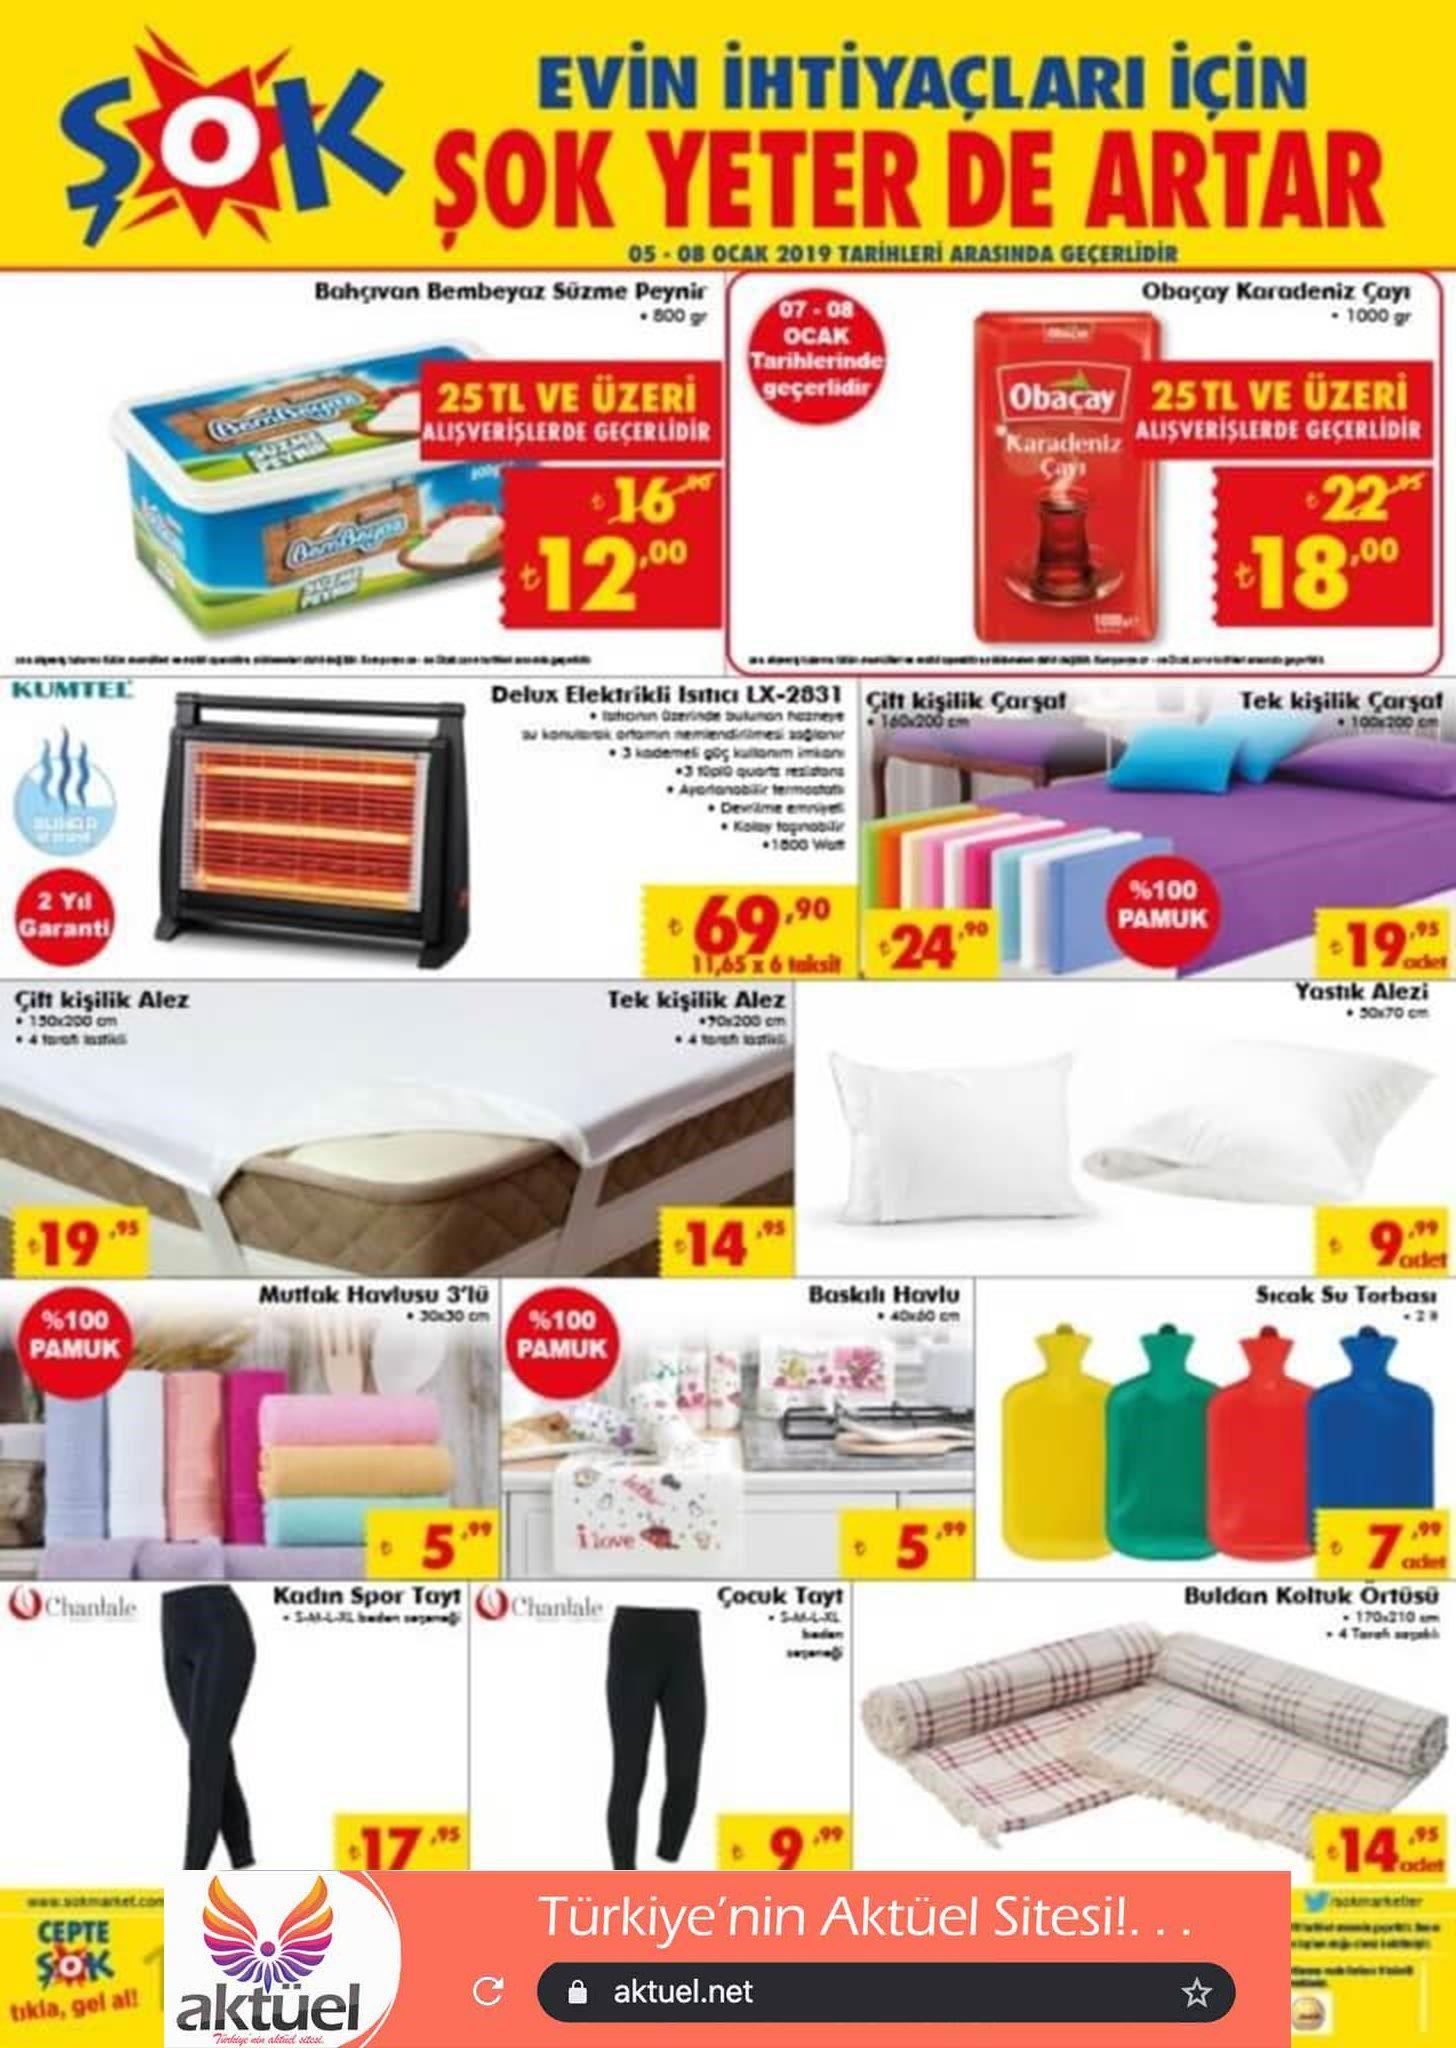 Sok Market Zula Fiyatlari 2020 Ocak 8 Ocak 9 Ocak